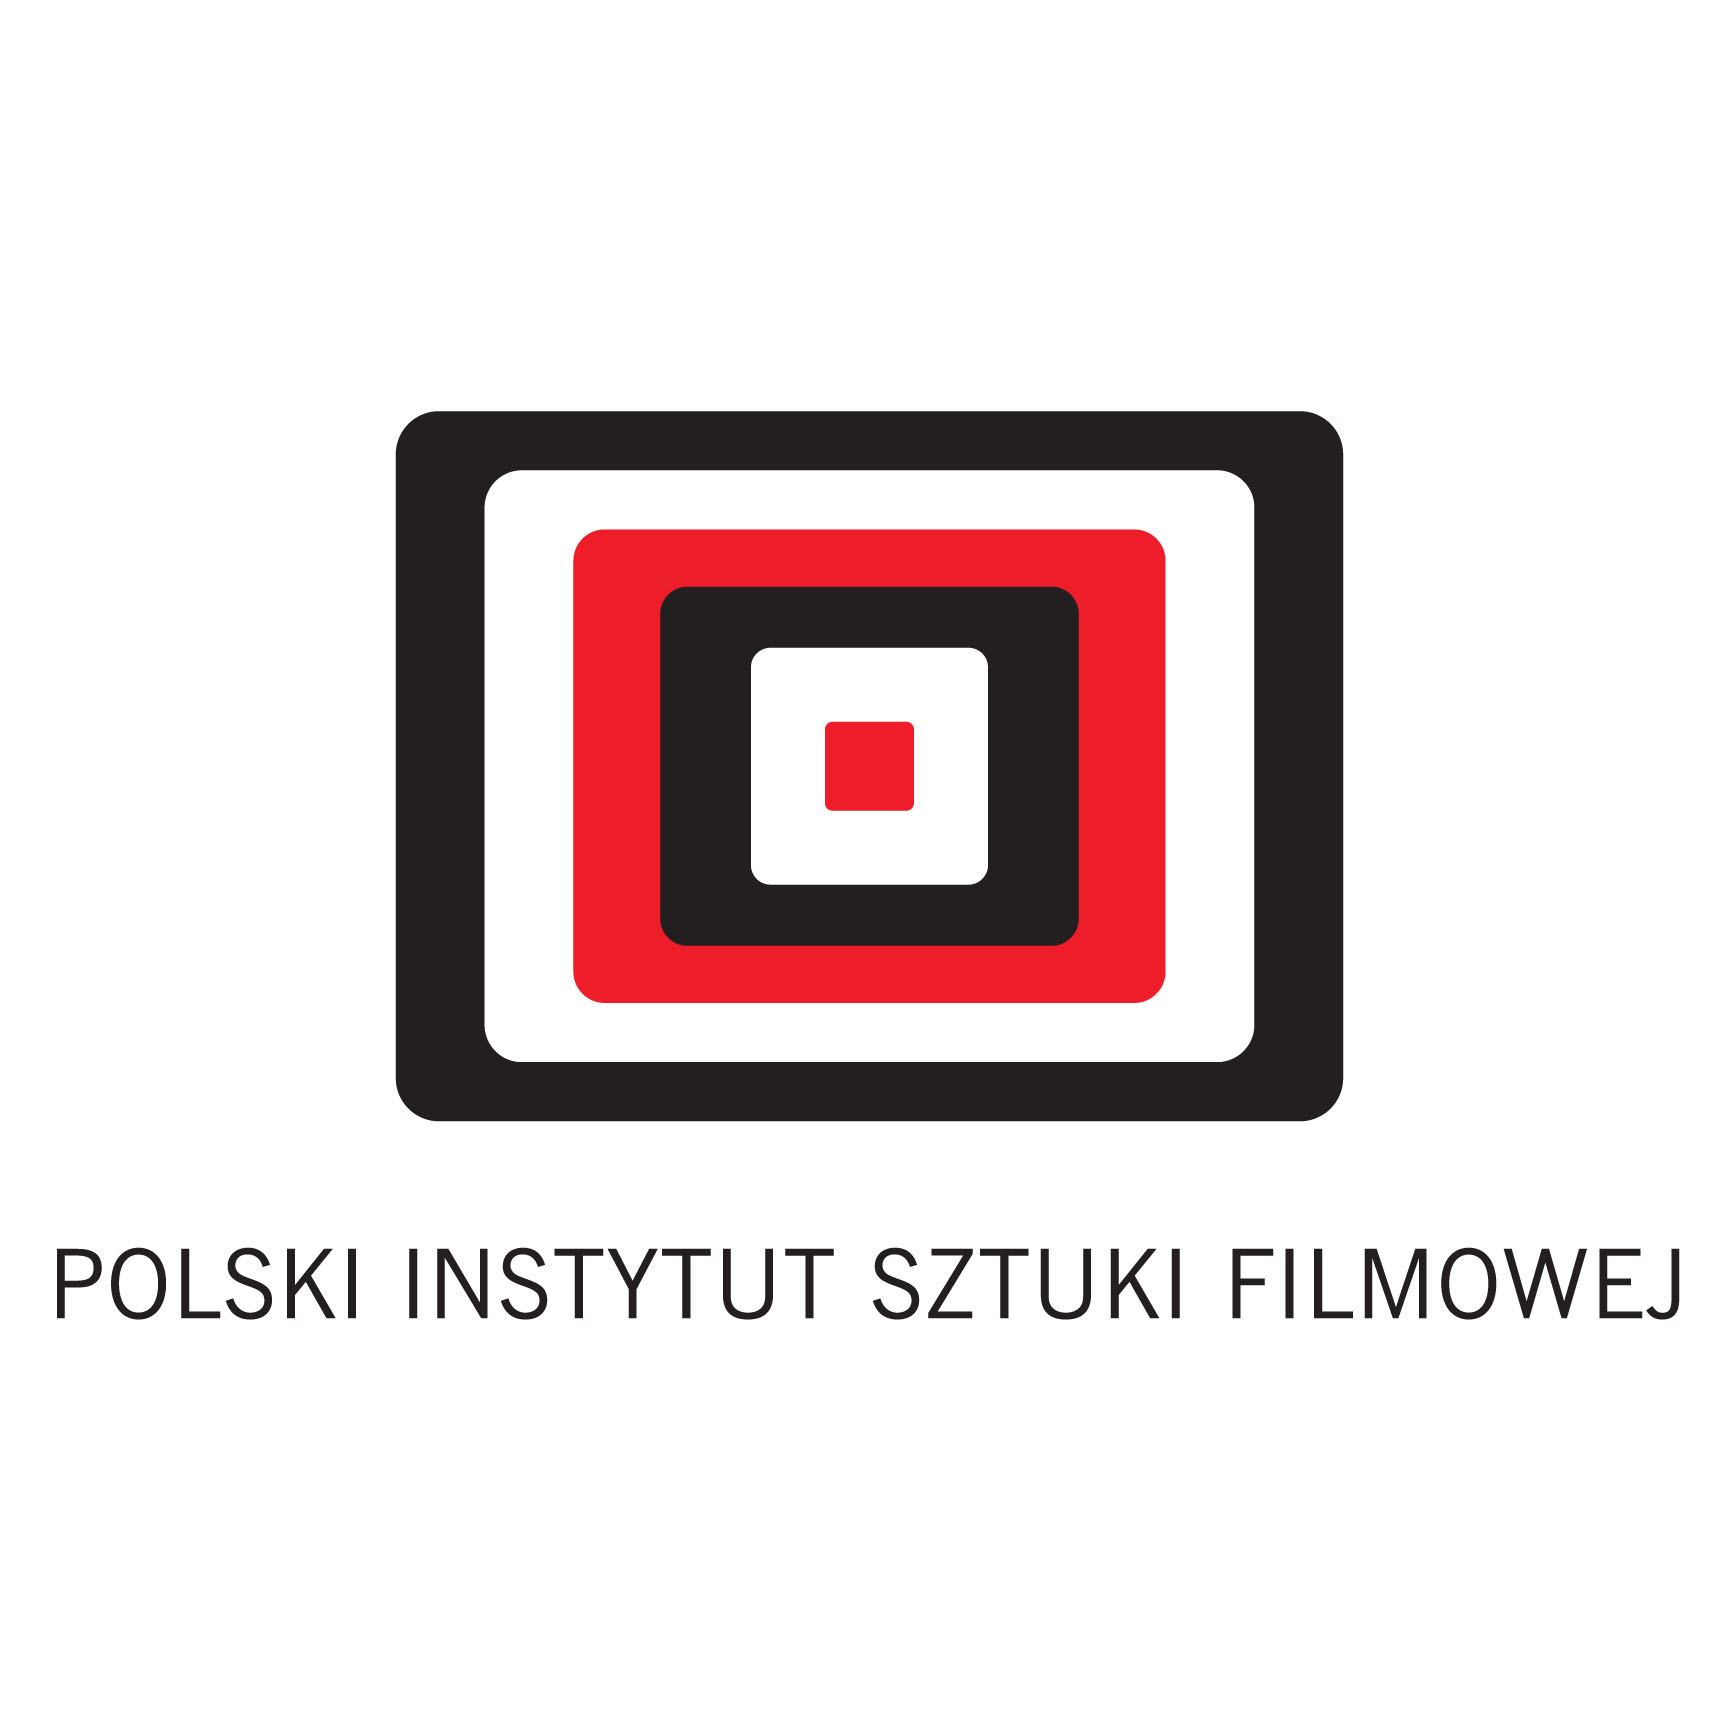 https://i2.wp.com/www.stentor.pl/files/produkty/pliki/pisfpol3.jpg